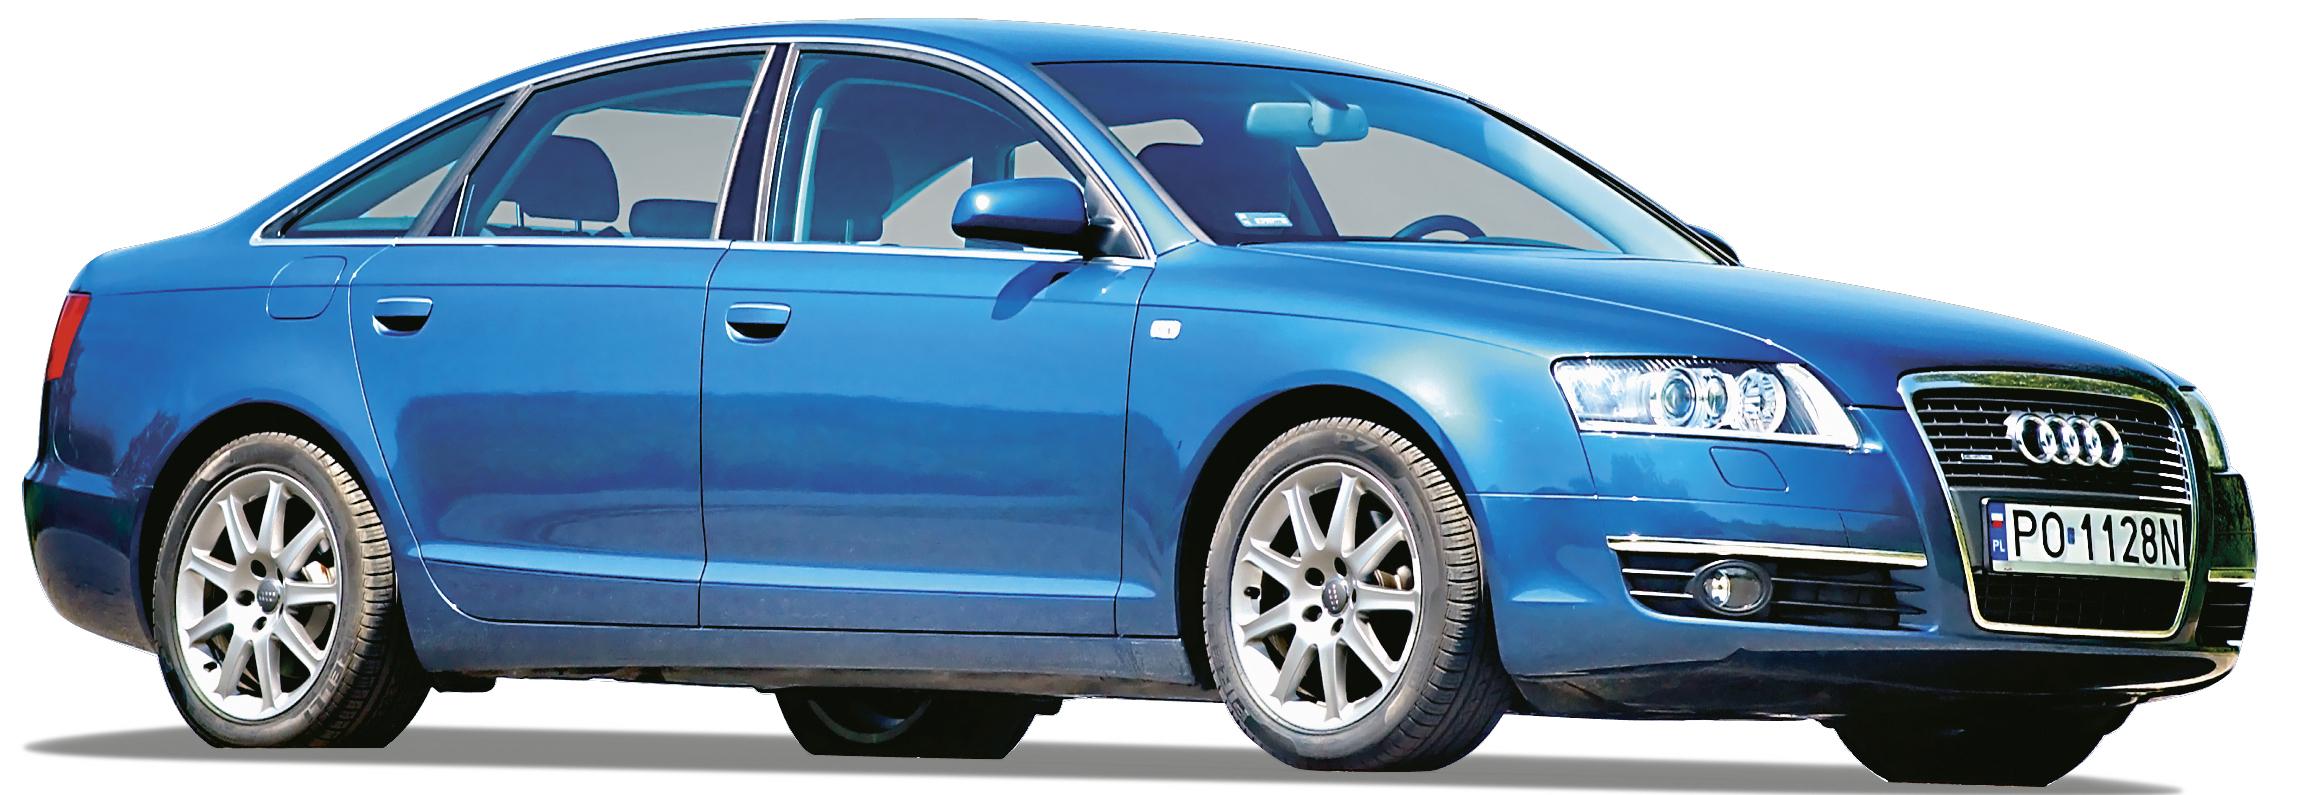 Audi A6 3.0 TDI V6